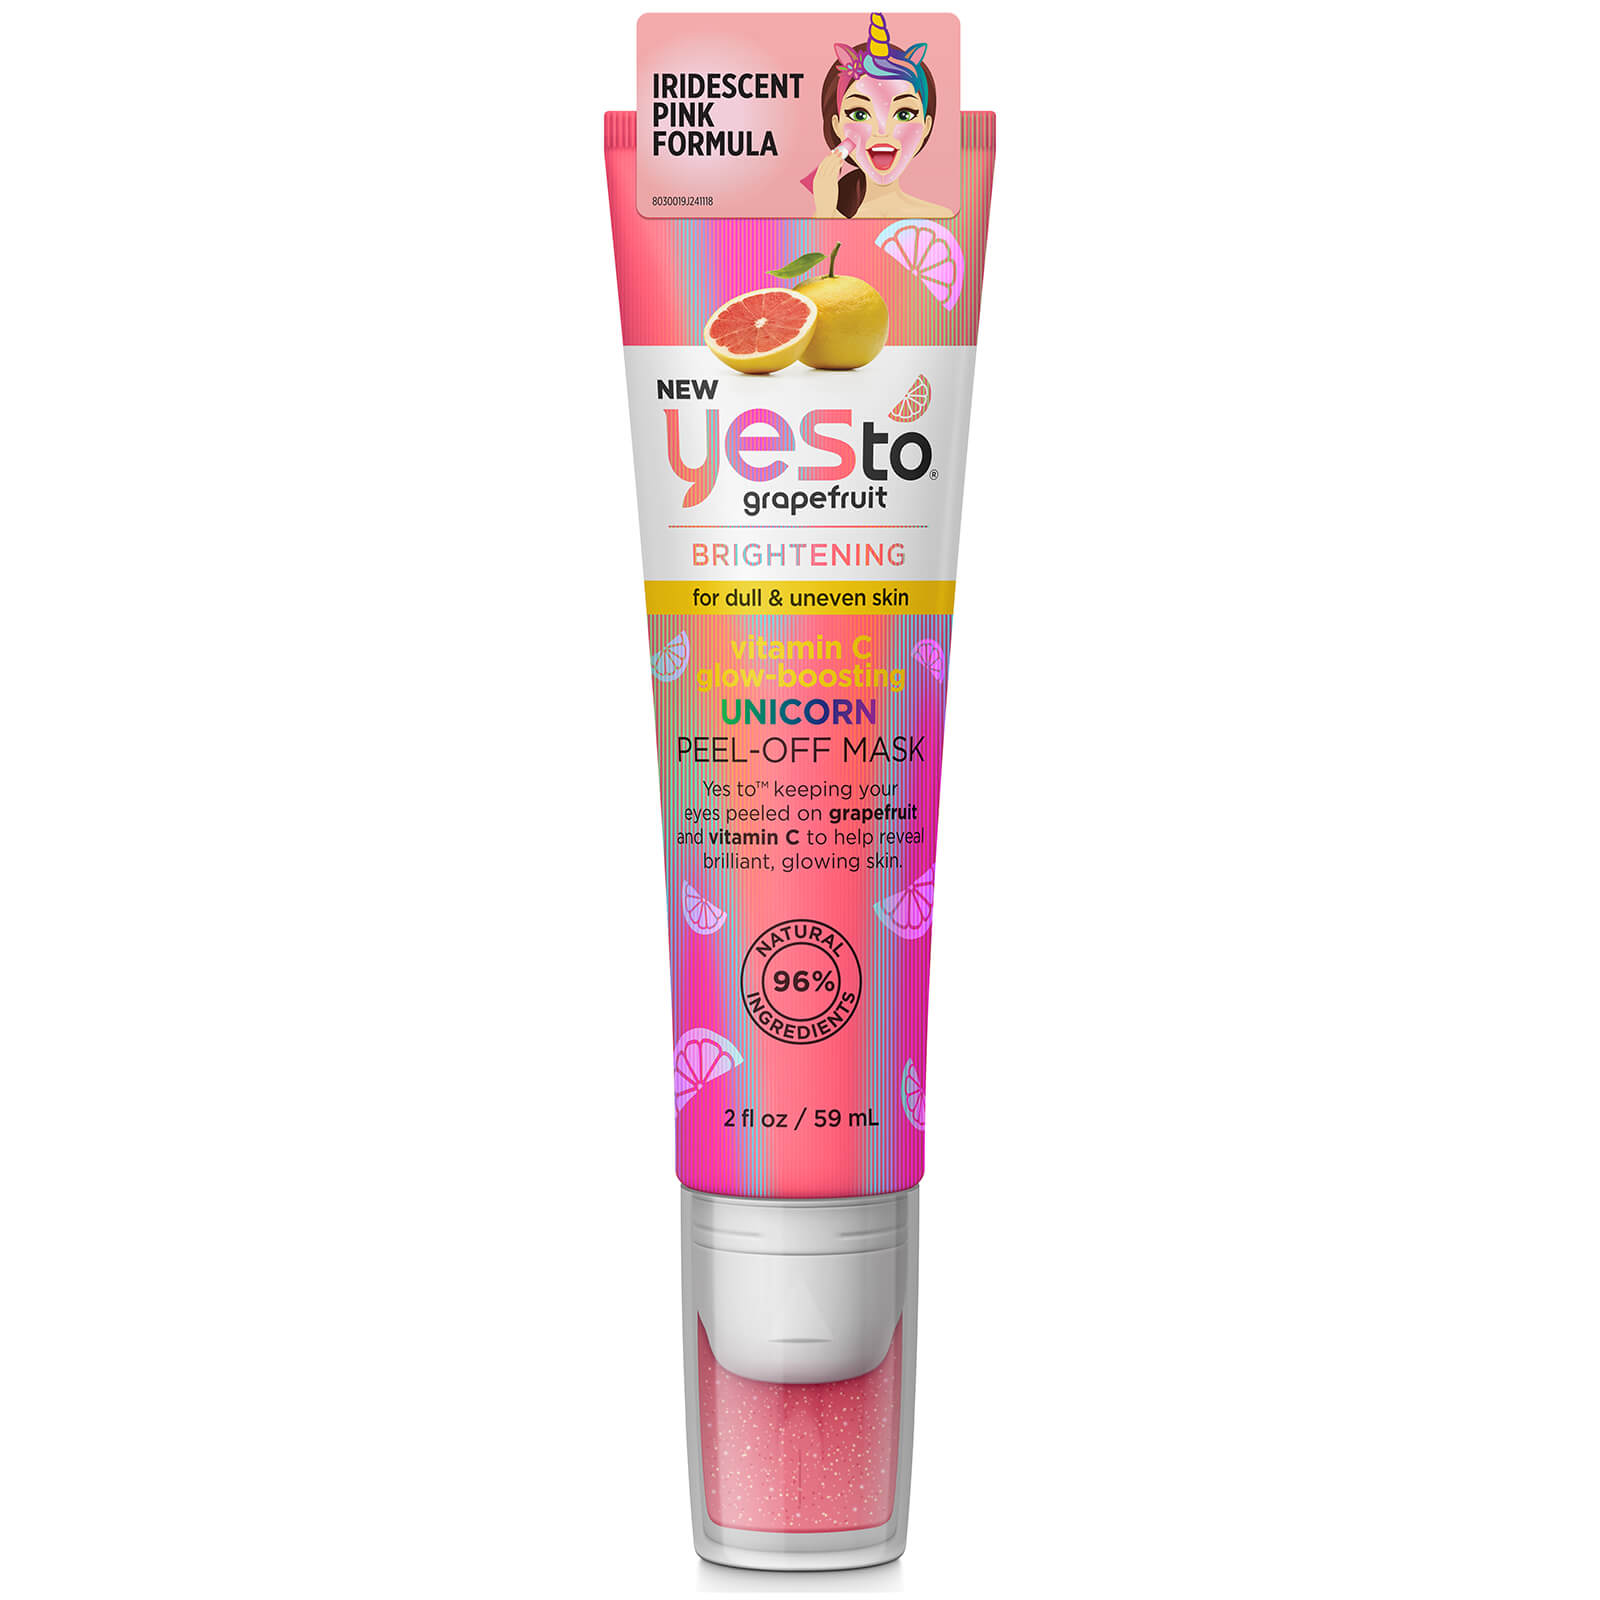 yes to grapefruit vitamin c glow boosting unicorn peel-off mask tube 59ml